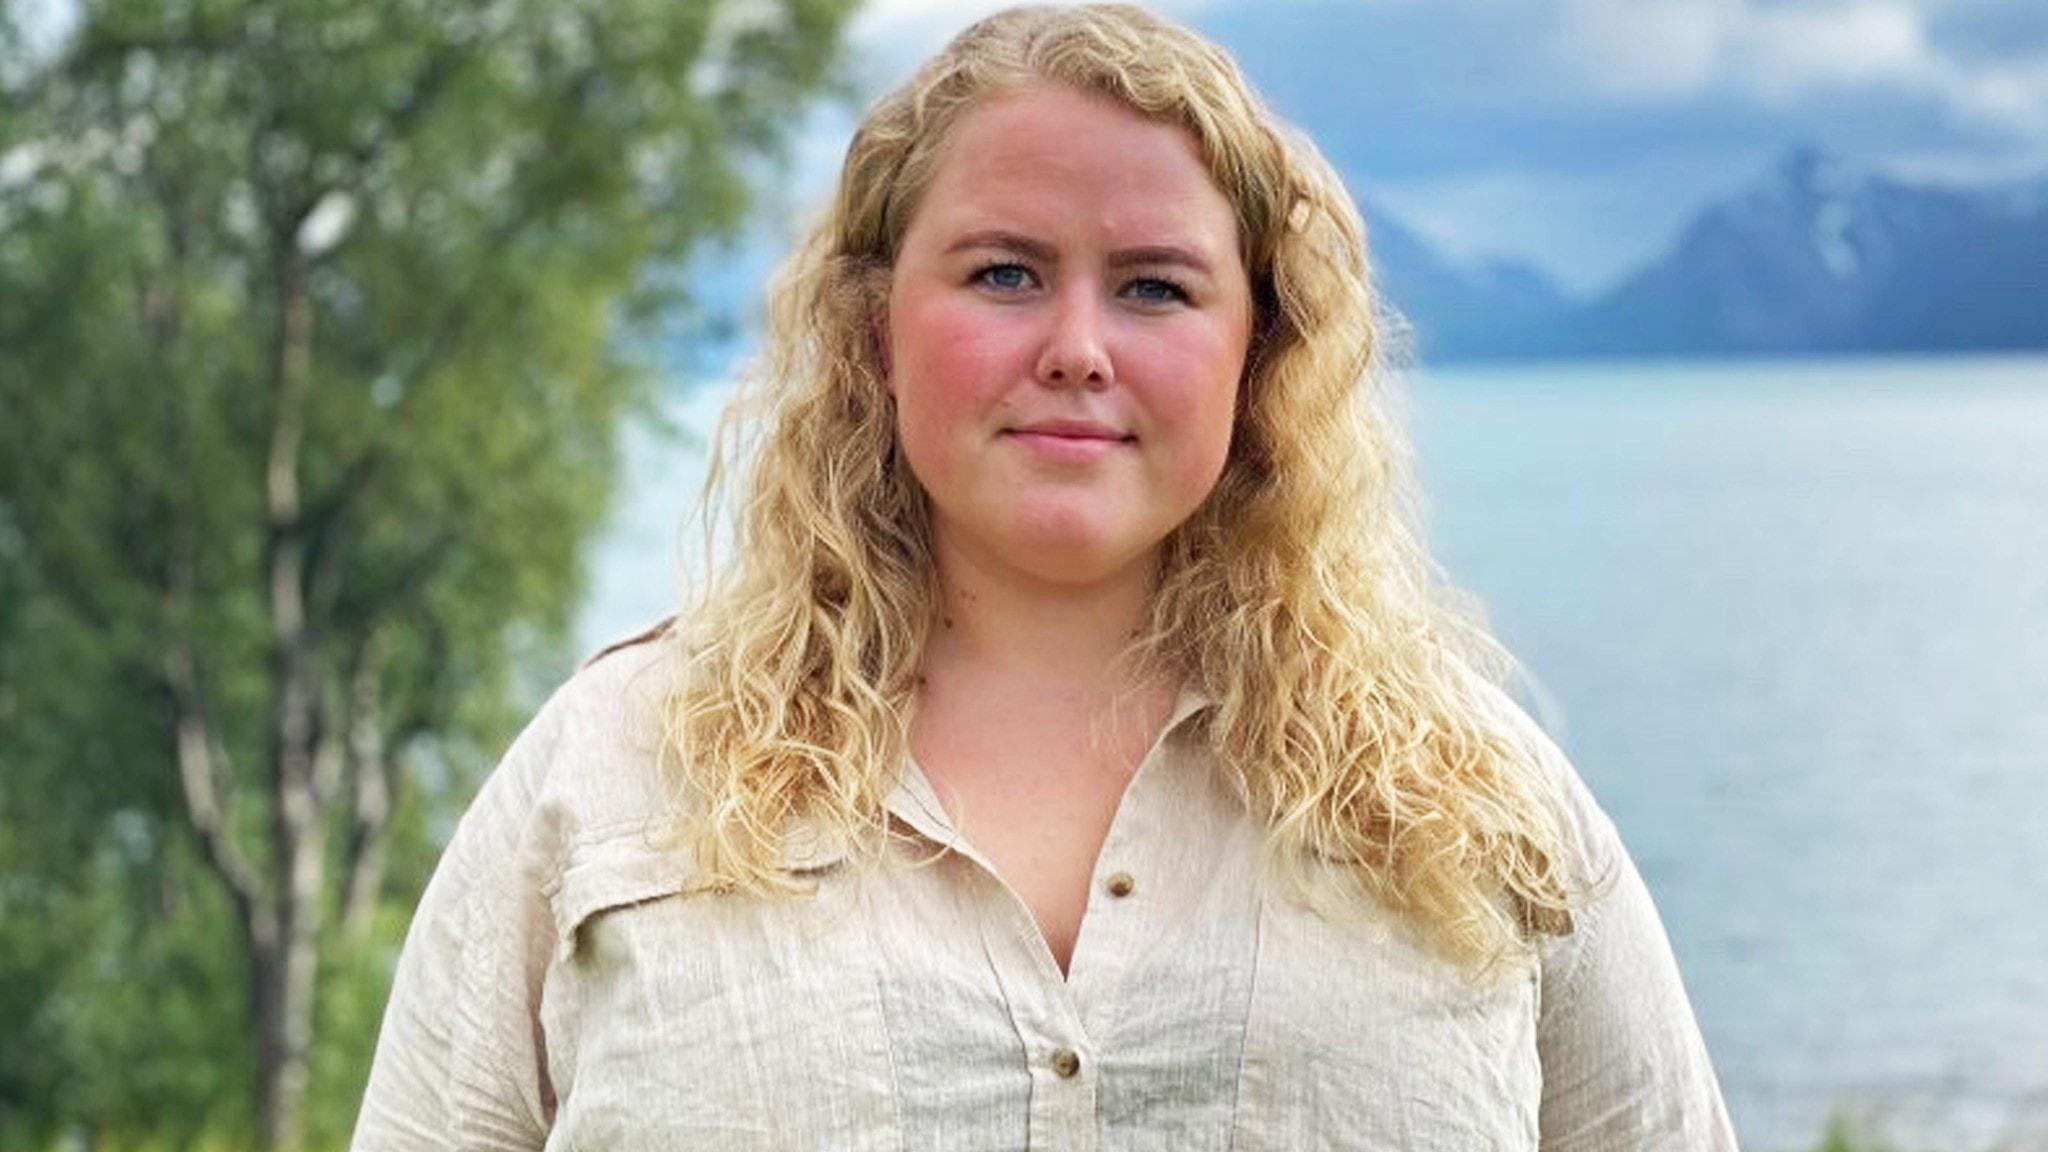 Hanne Linaker står med en sjö i bakgrunden.